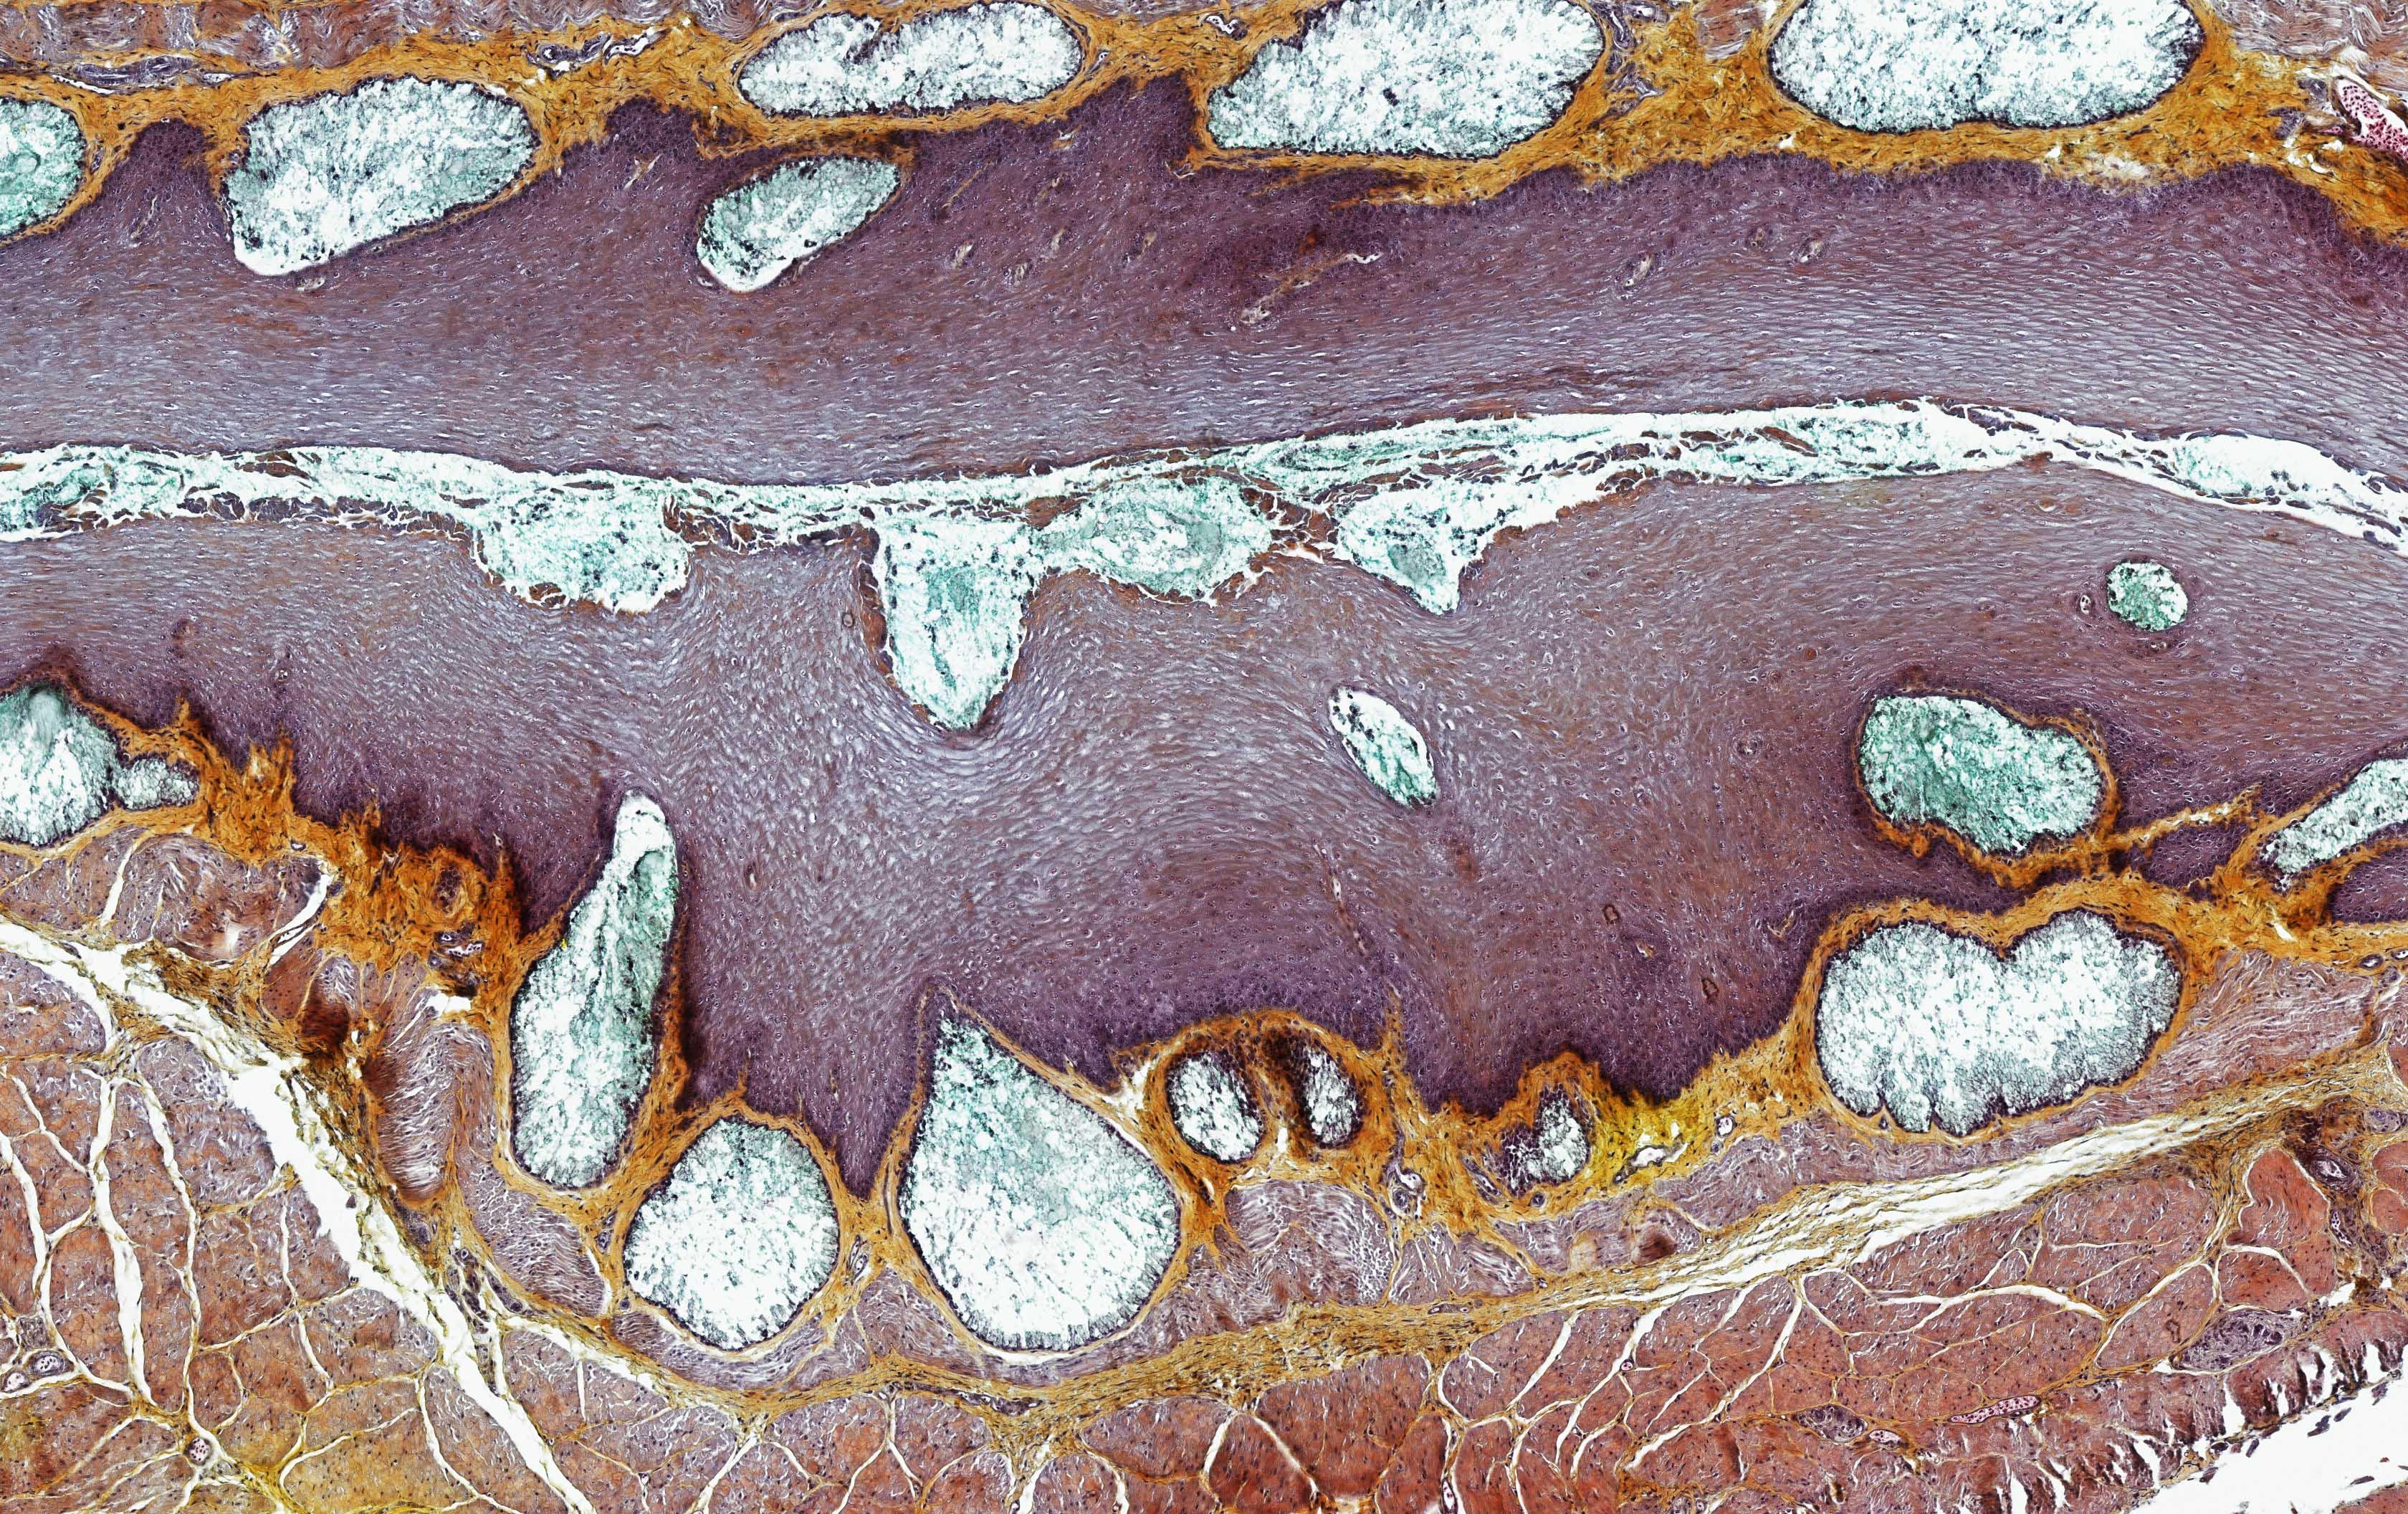 ALTHISIA movat pentachrome 11